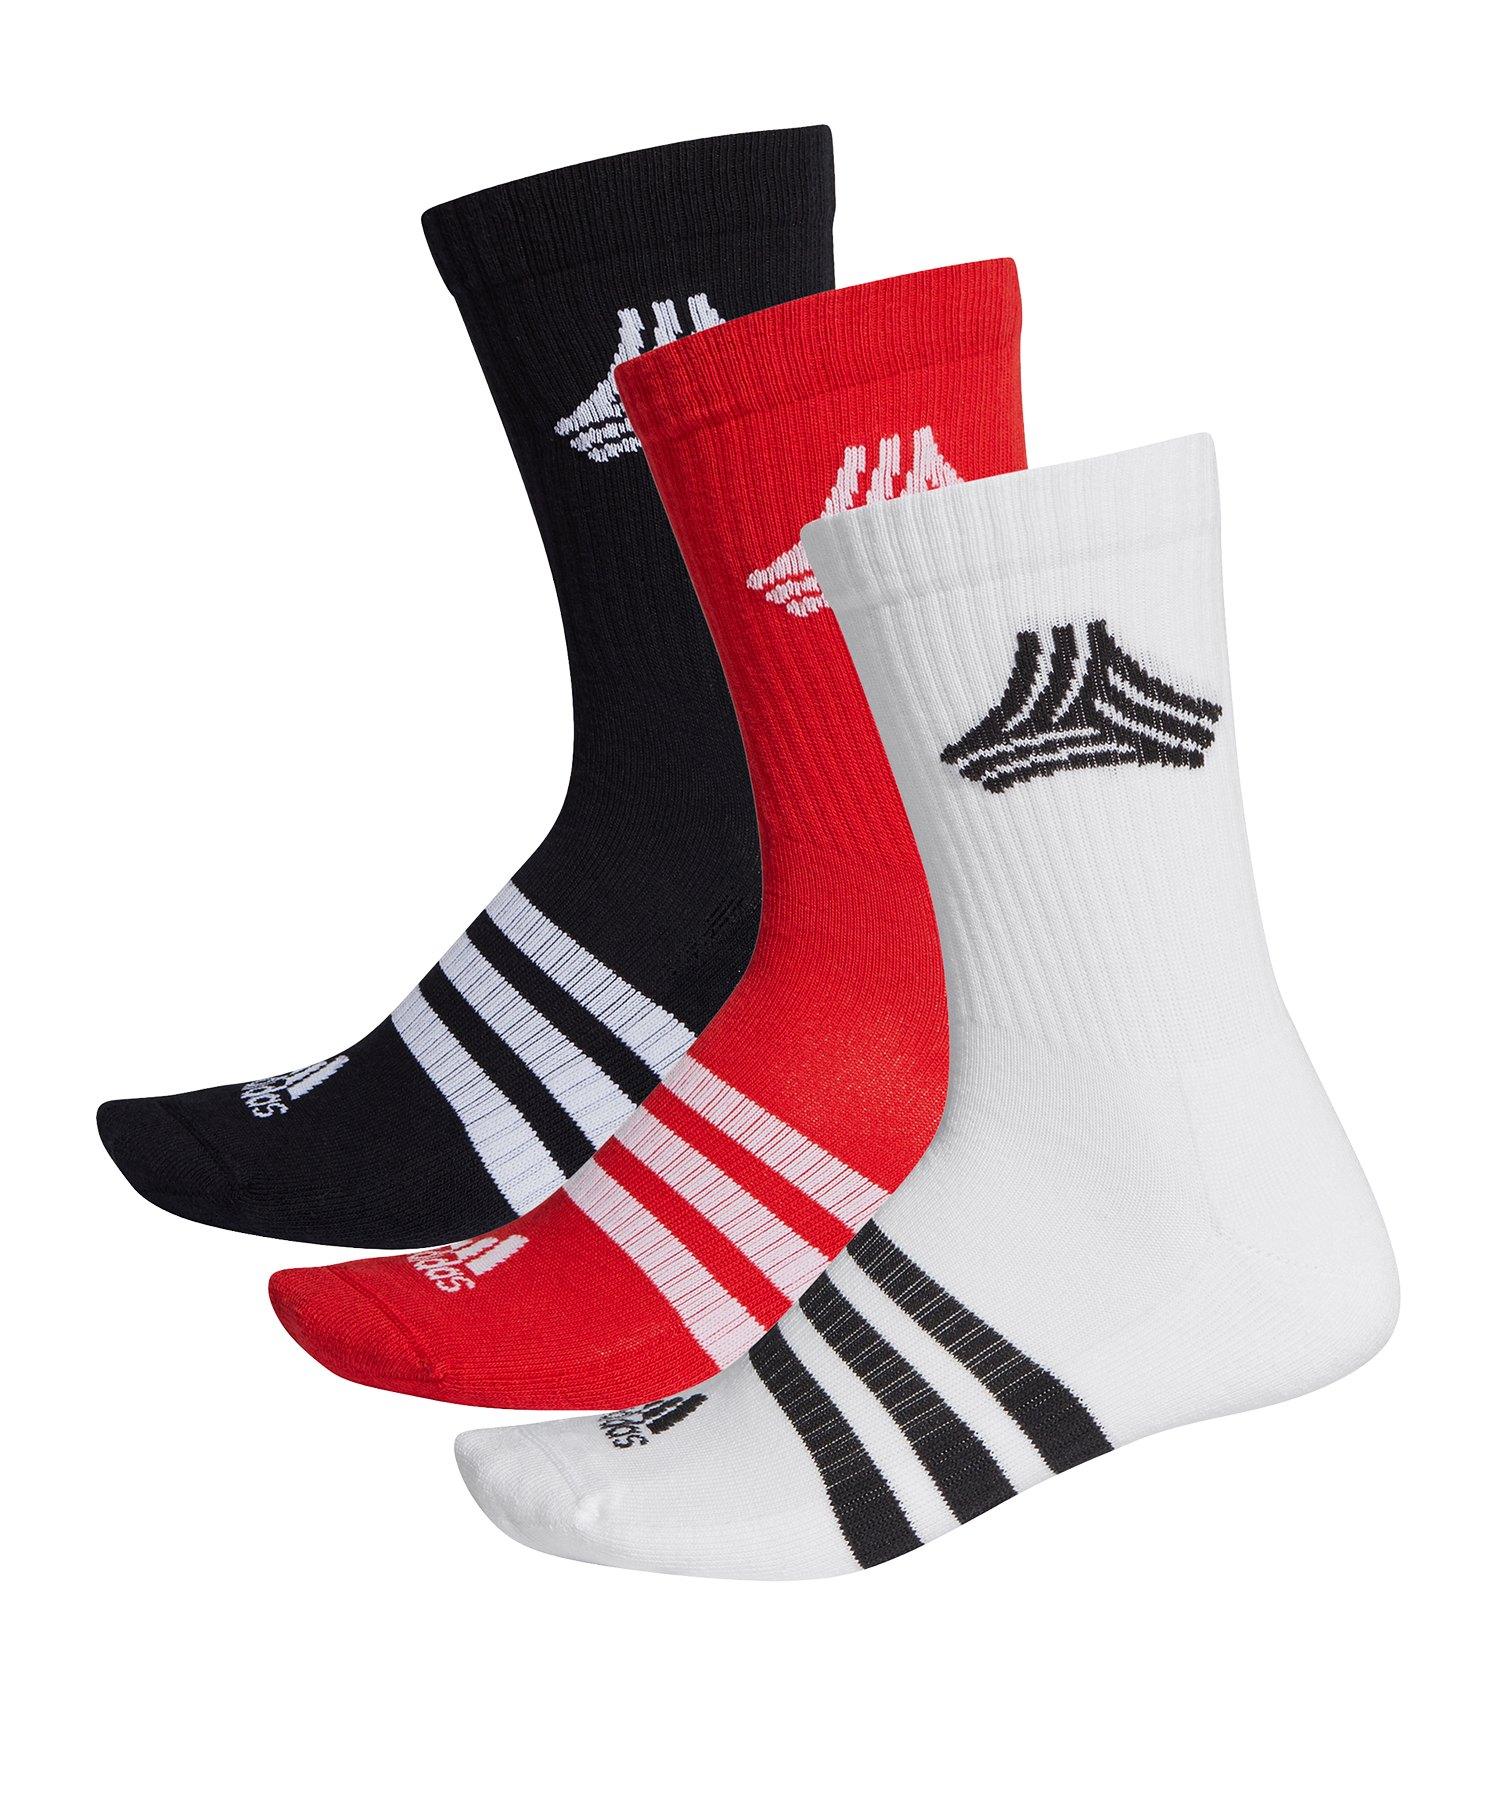 adidas FS 3S Crew Socks Socken Weiss Schwarz Rot - weiss